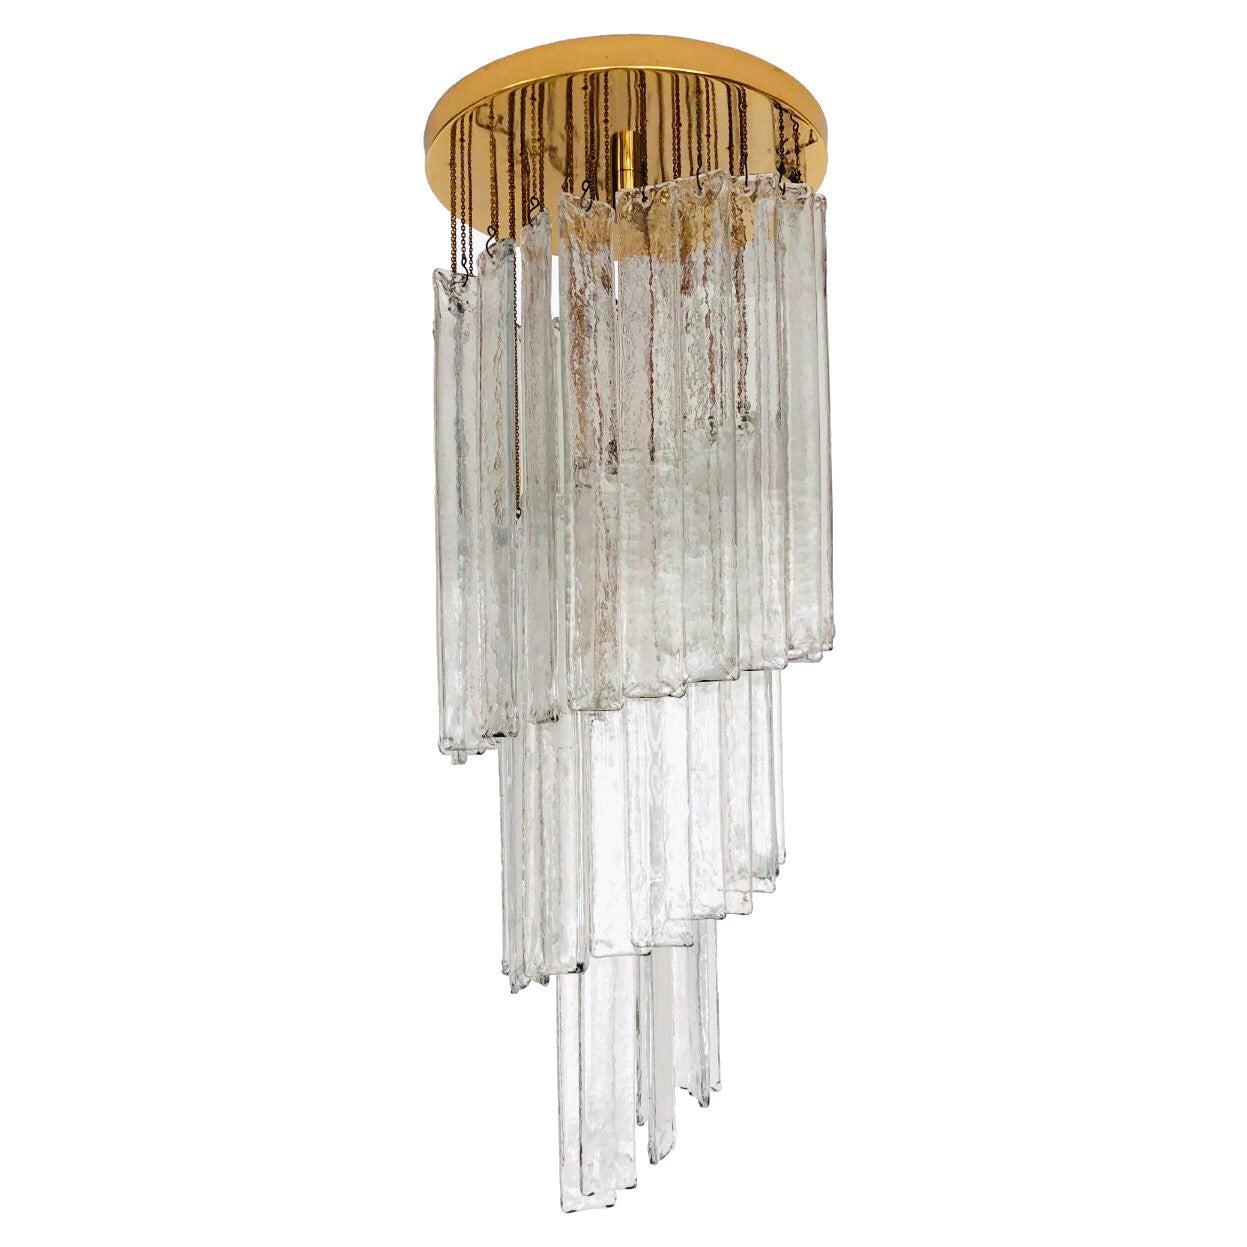 Italian Midcentury Clear Murano Glass Chandelier by Mazzega, 1970s